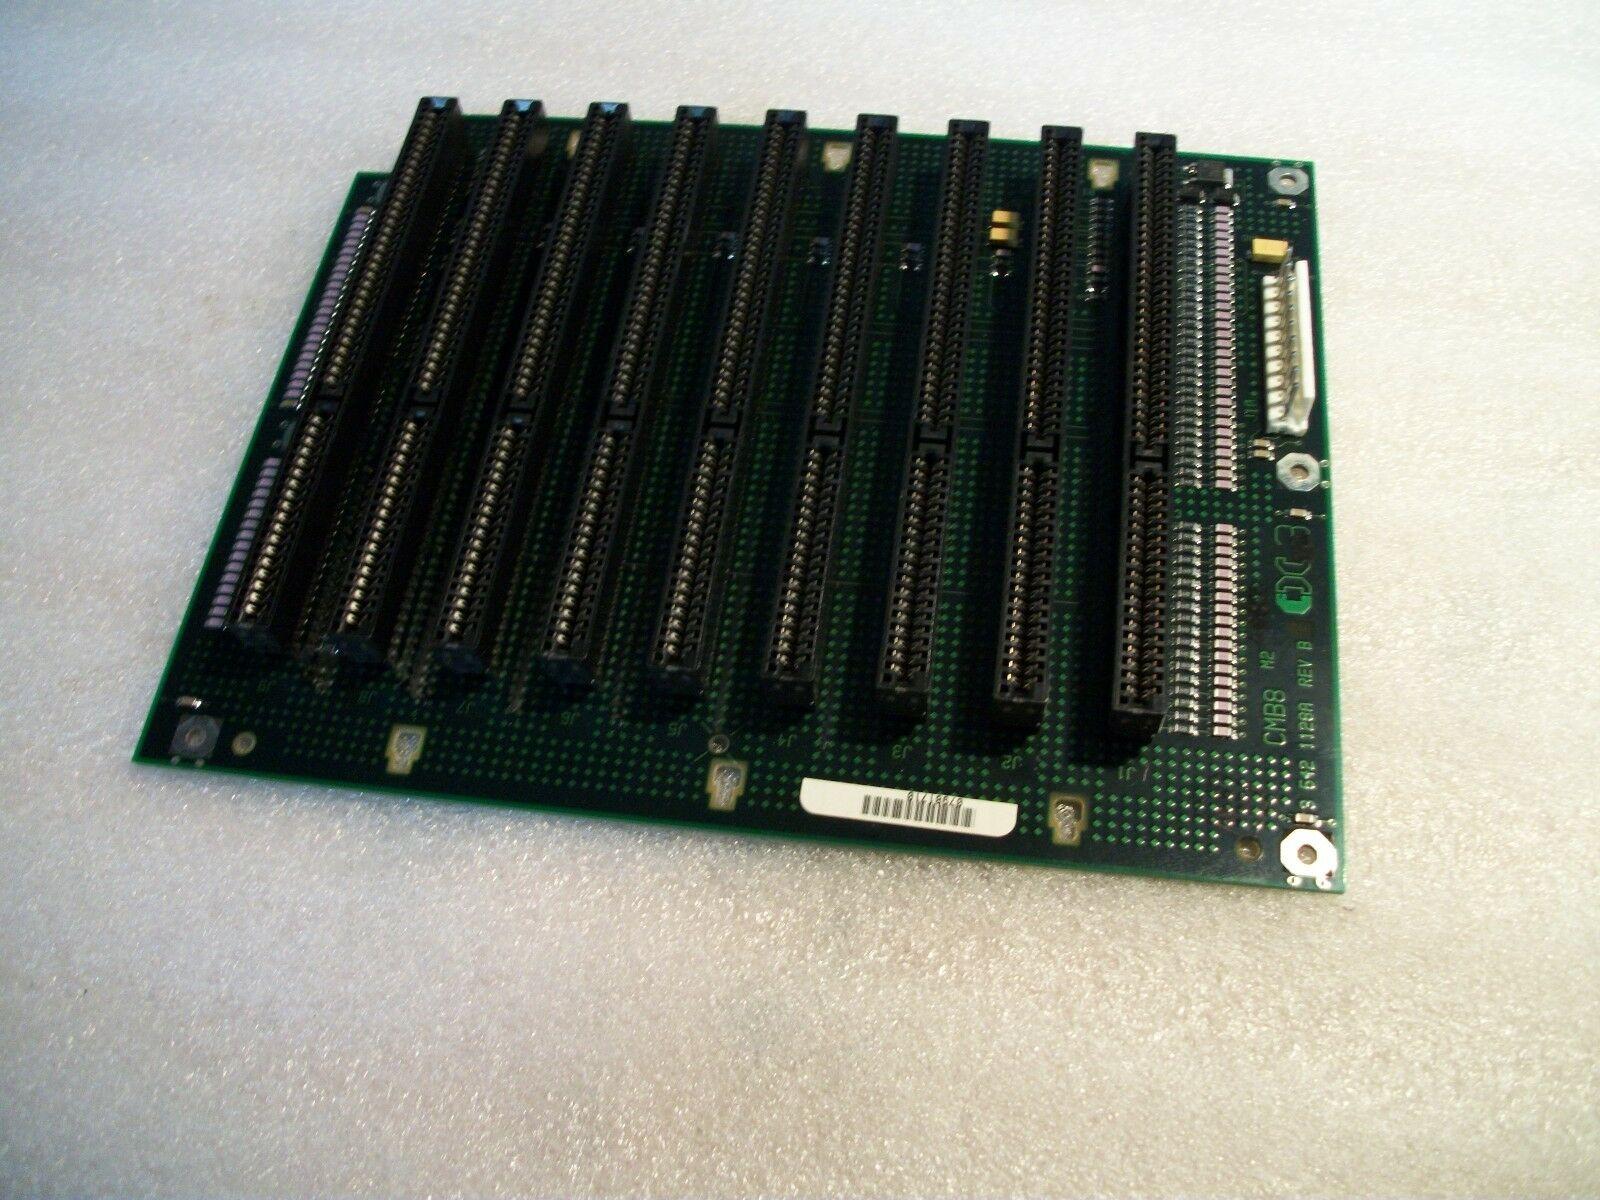 Cincinnati Milacron Siemens CNC Control Circuit Board CMB8 3-542-1128A